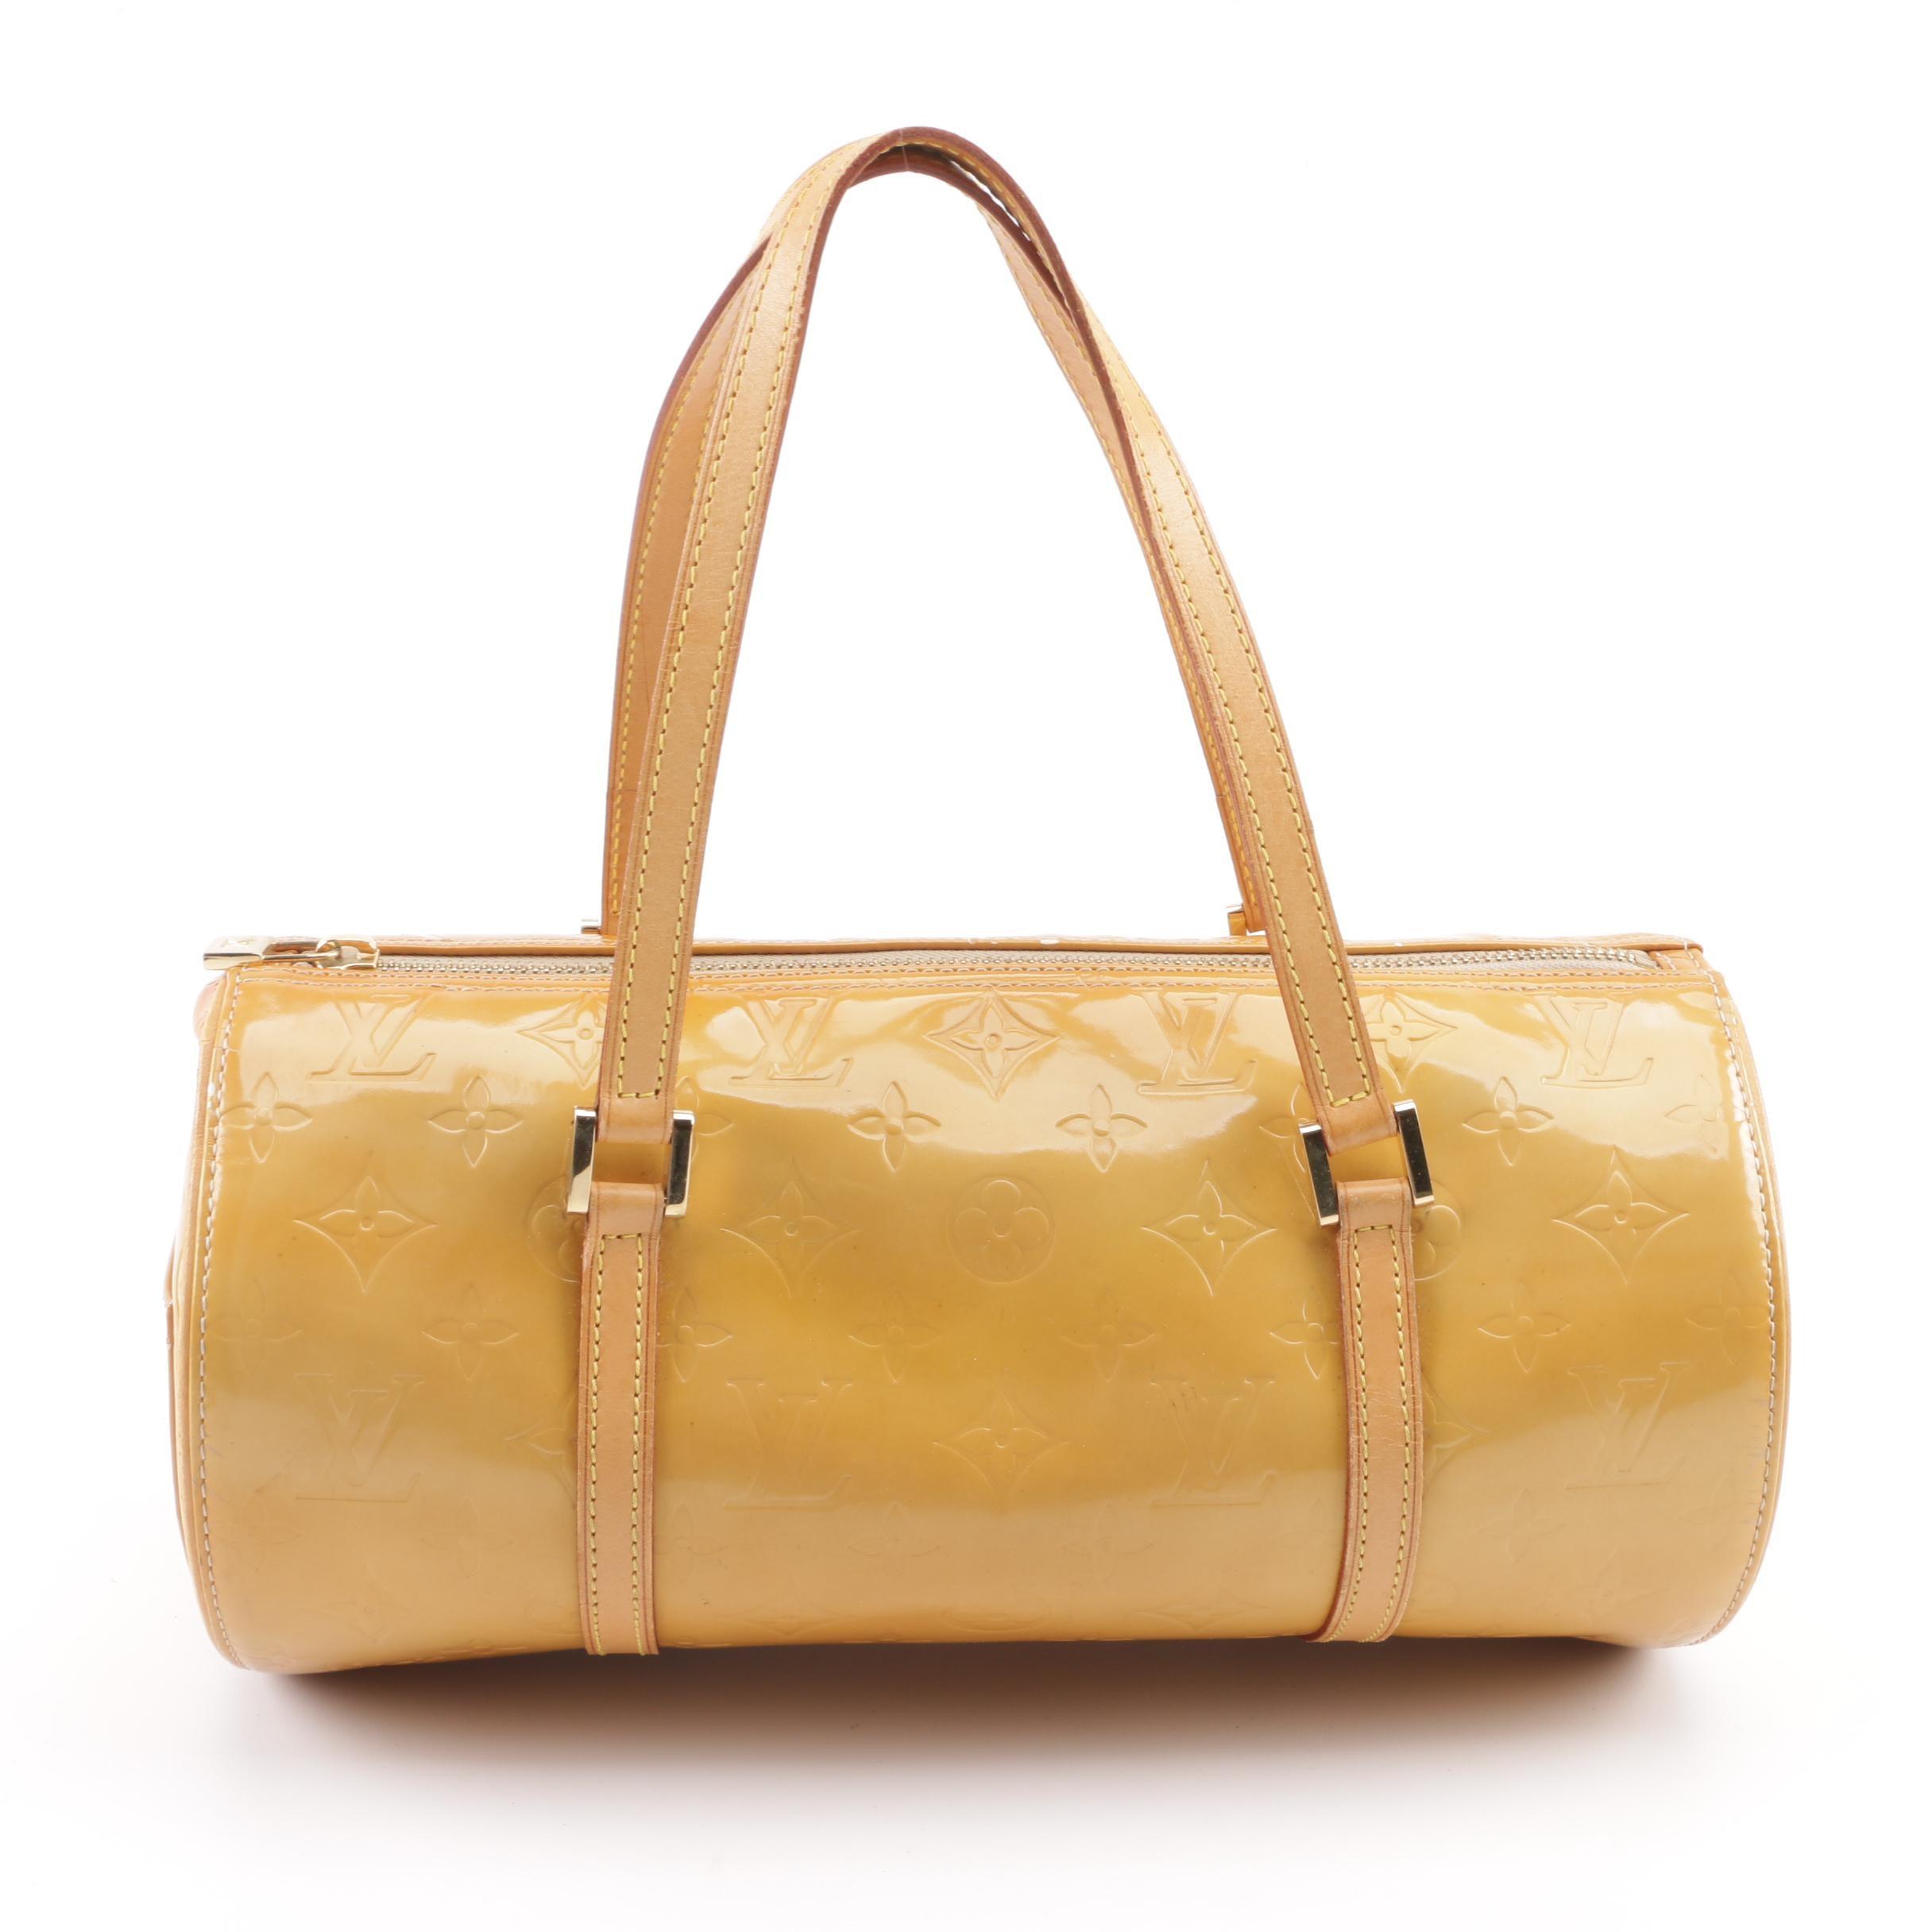 1999 Louis Vuitton of Paris Mango Vernis Monogram Papillon 30 Handbag